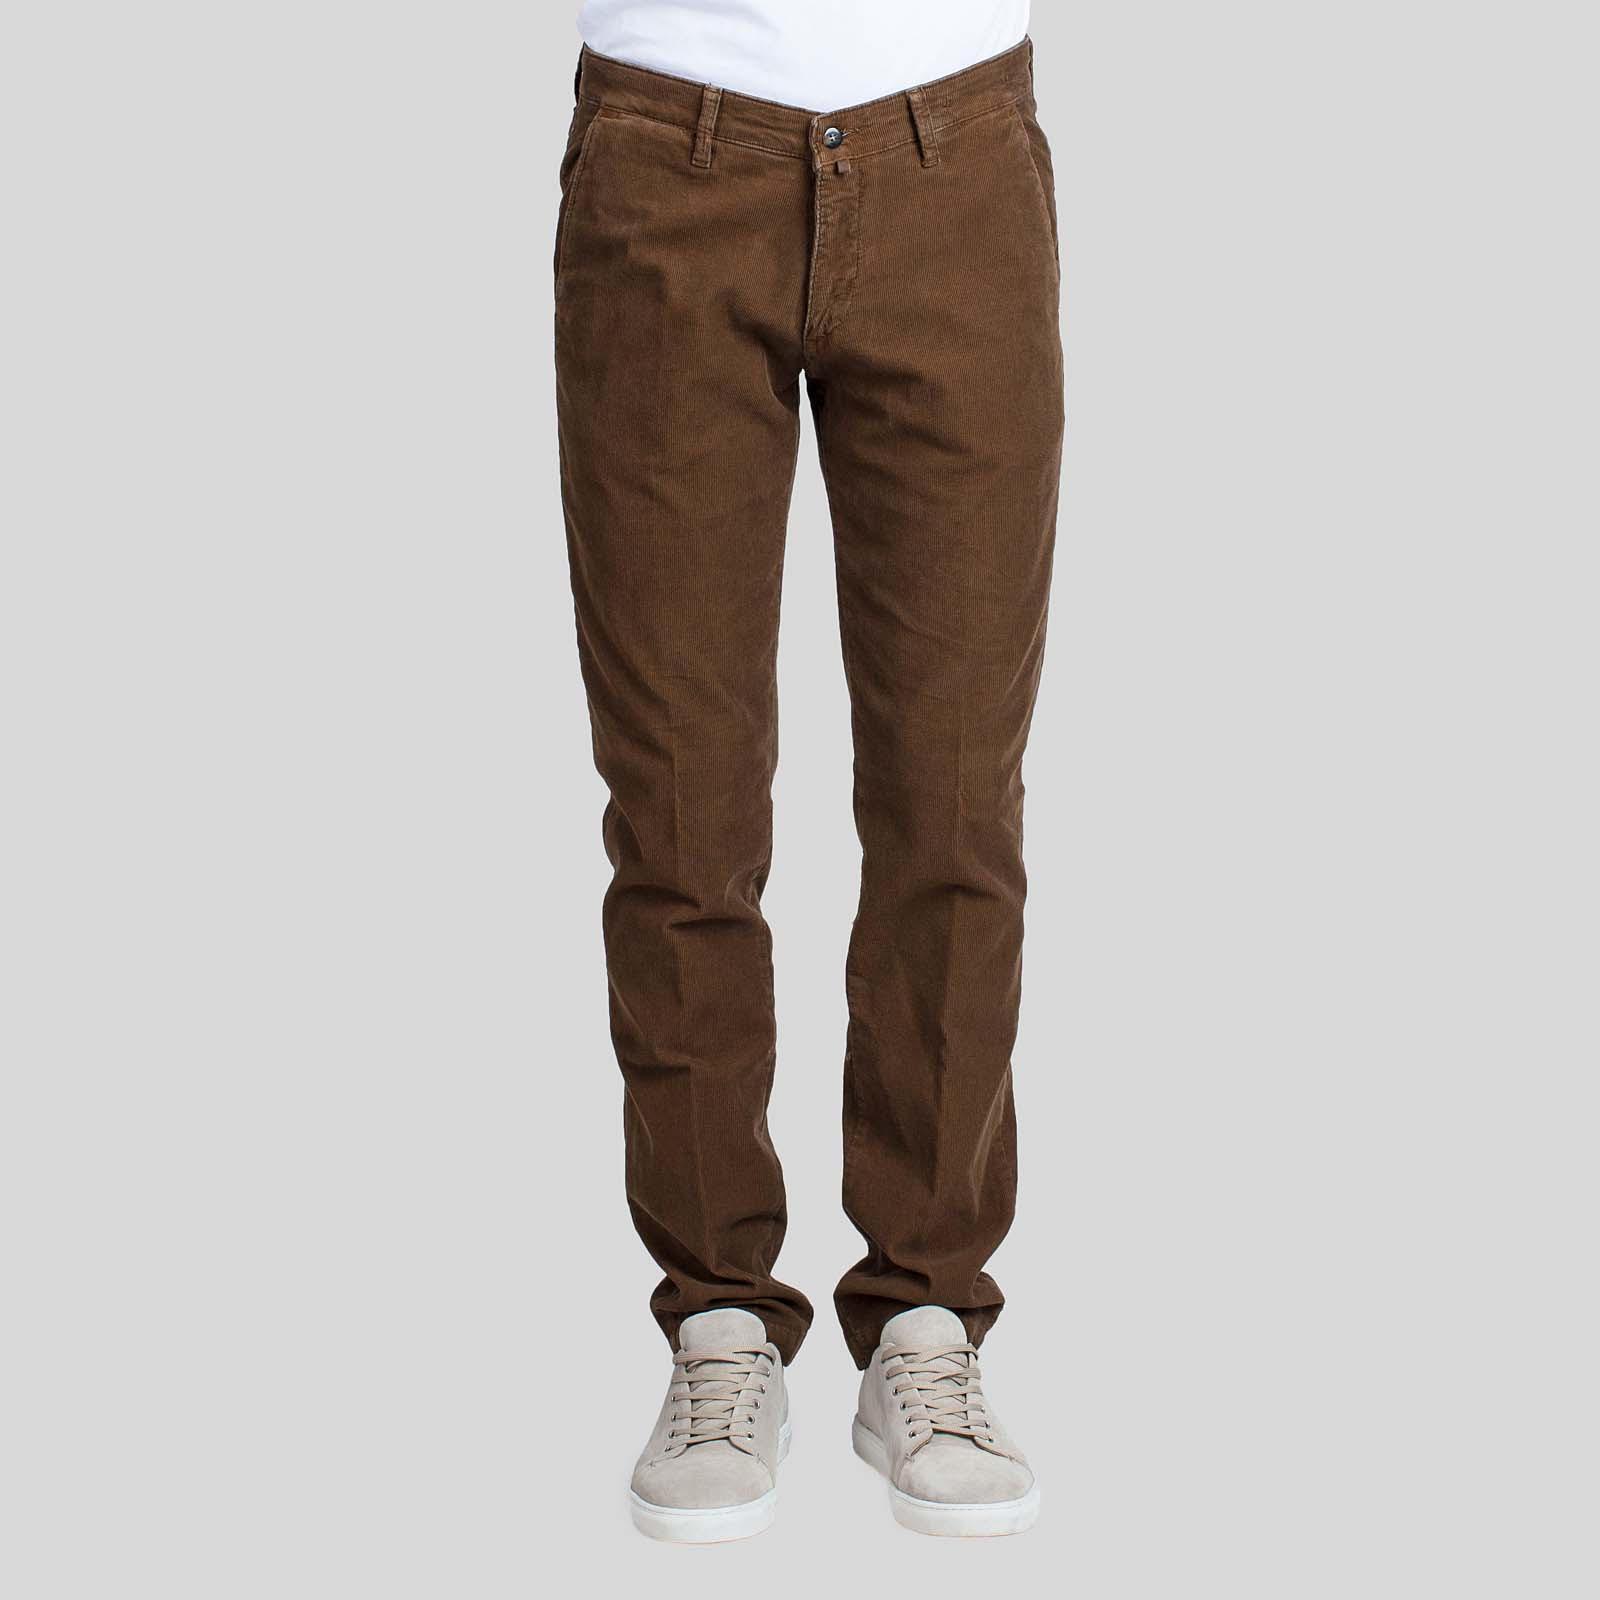 4/10 FOUR.TEN INDUSTRY Σκούρο Καφέ Κοτλέ Παντελόνι Μέση με θηλιές ζώνης Κούμπωμα με φερμουάρ και κουμπί Δύο κάθετες τσέπες στο πλάι Δύο τσέπες πίσω Κανονική γραμμή Μέγεθος δείγματος : 48 Σύνθεση: 98% Βαμβάκι, 2% Ελαστίνη